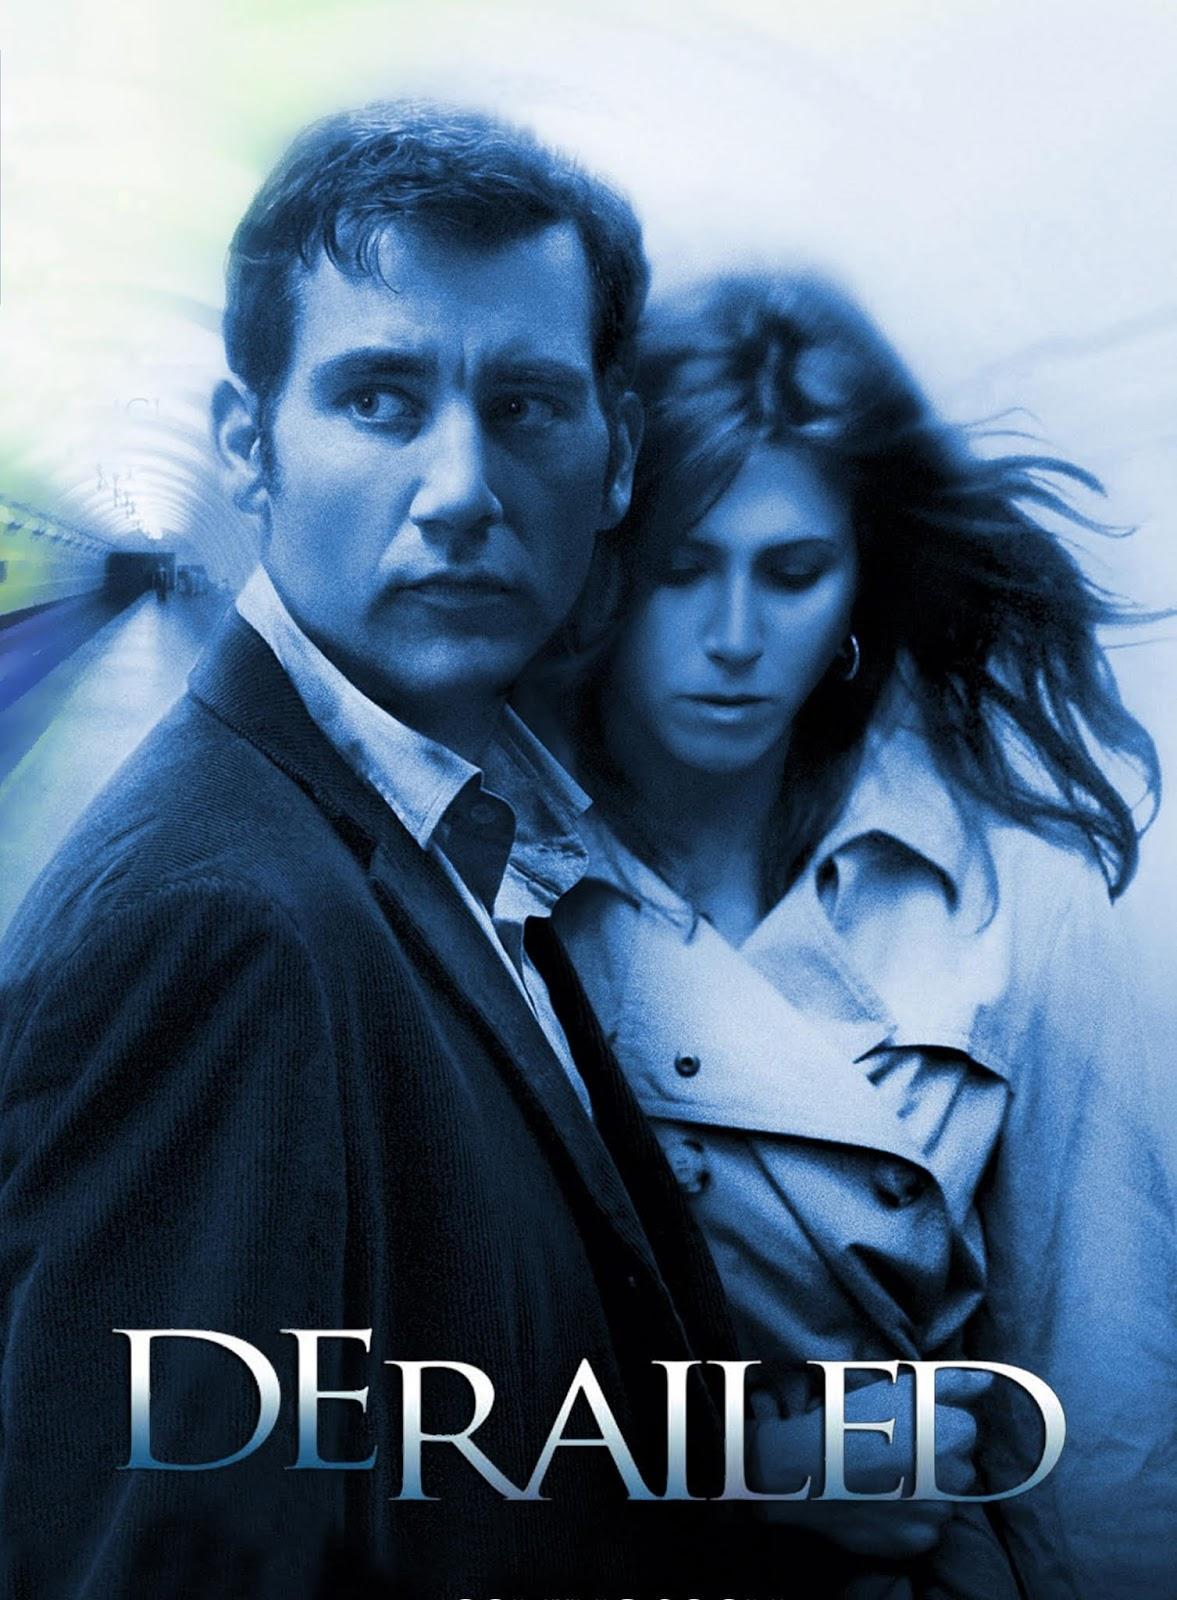 Derailed [2005] [DVDR] [NTSC] [Subtitulado]